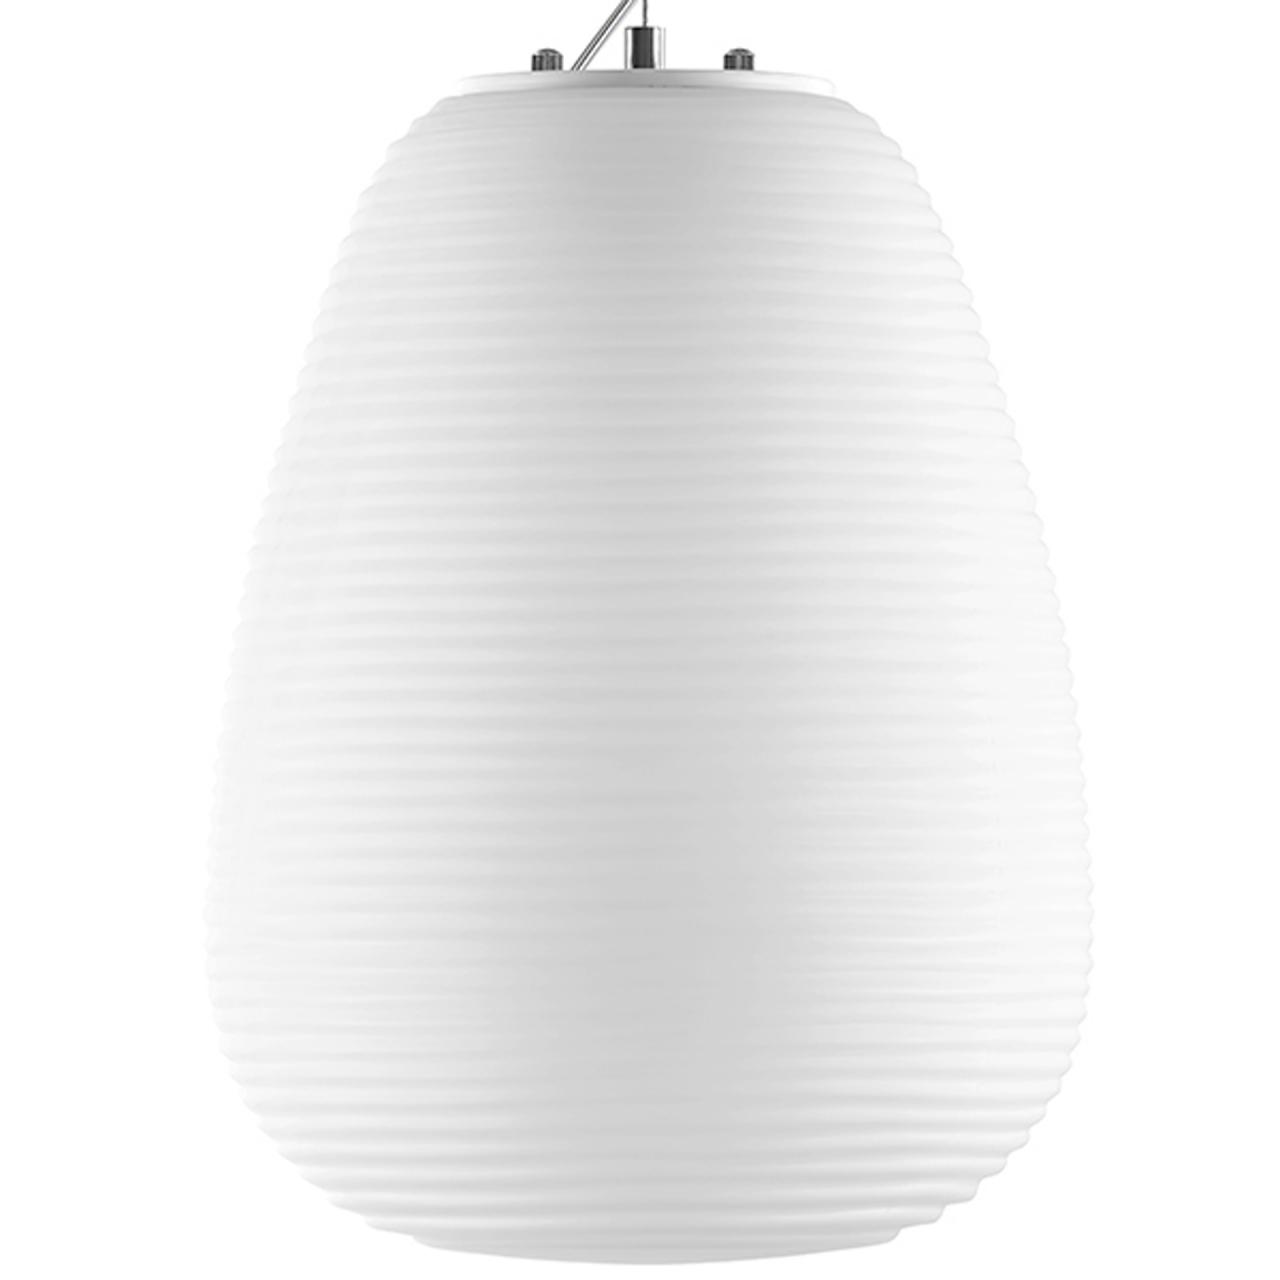 Люстра подвесная Arnia 1Х40W E27 Белый Lightstar 805012